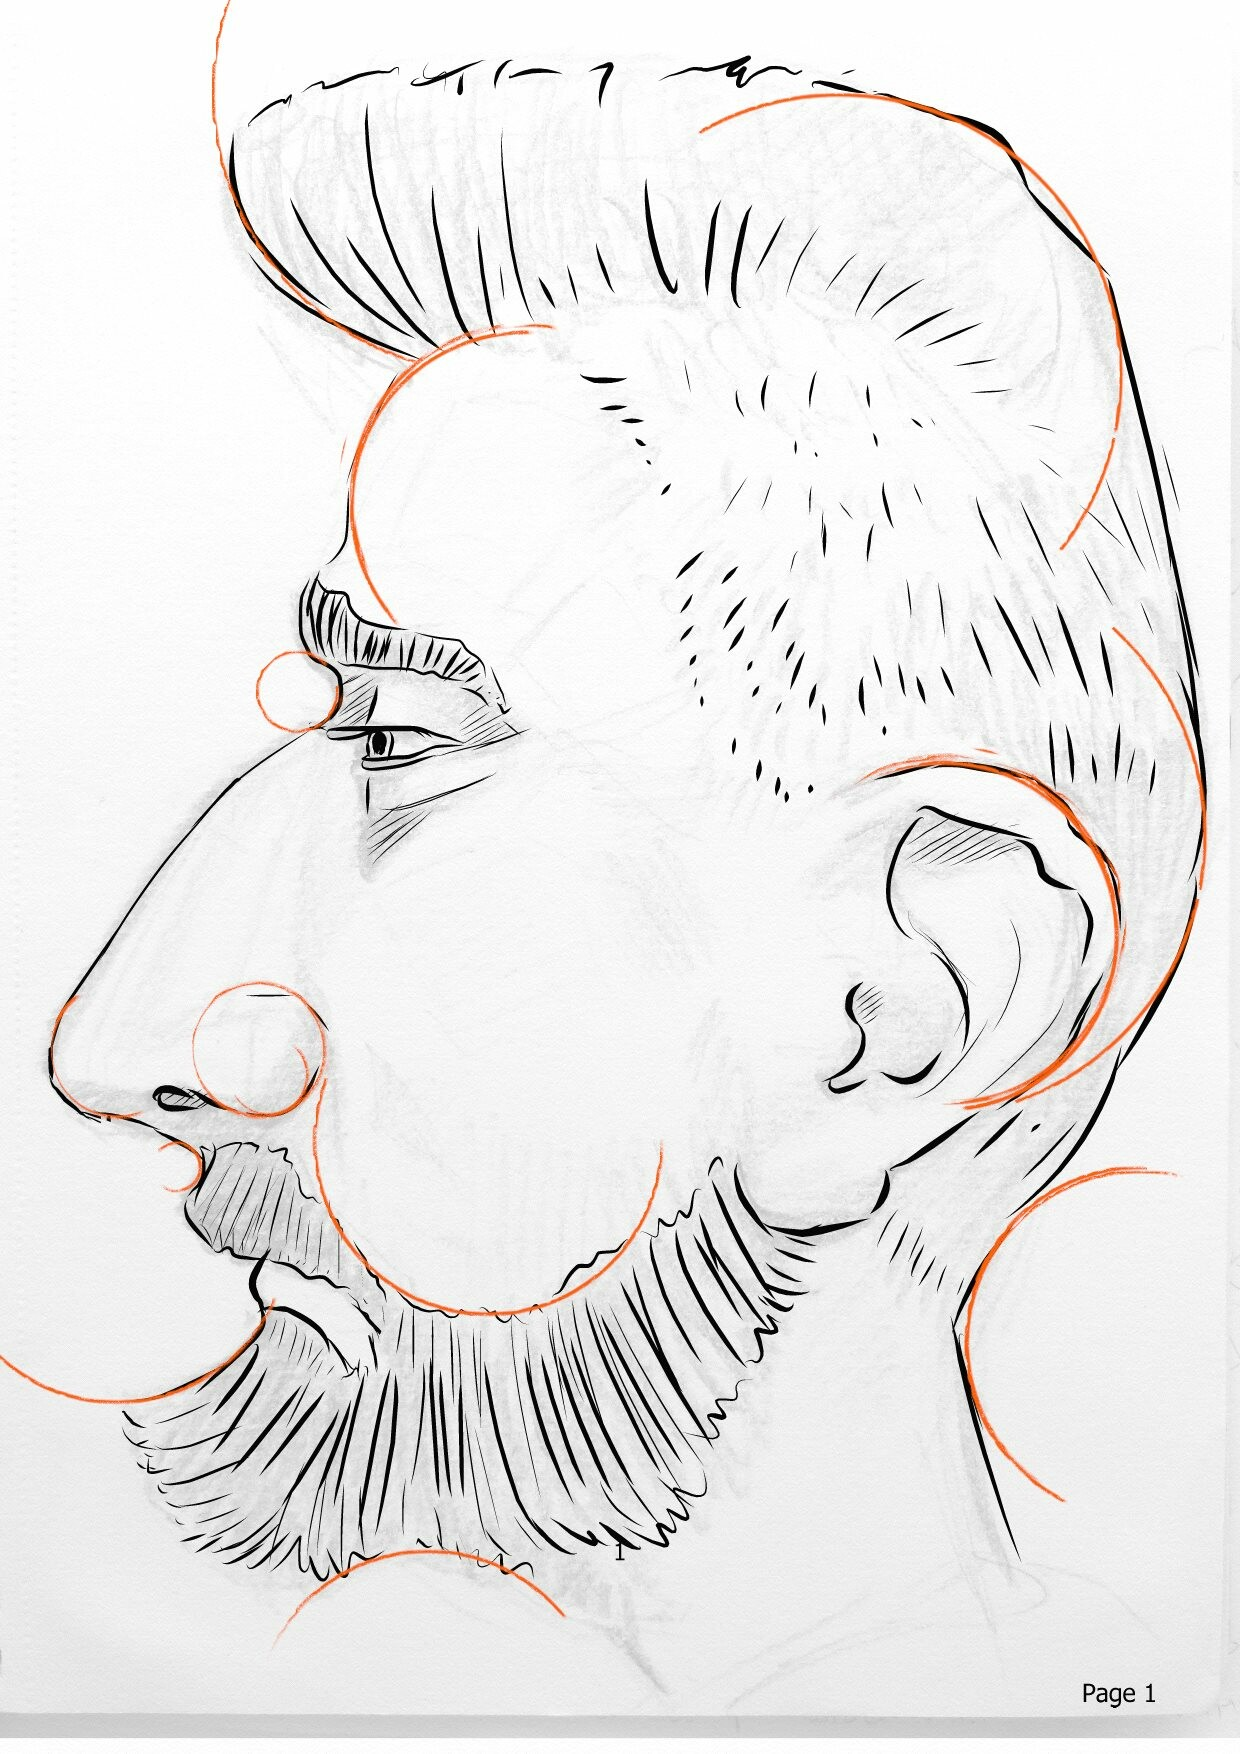 Mark grizenko caricature profile 01 wgoldenratio